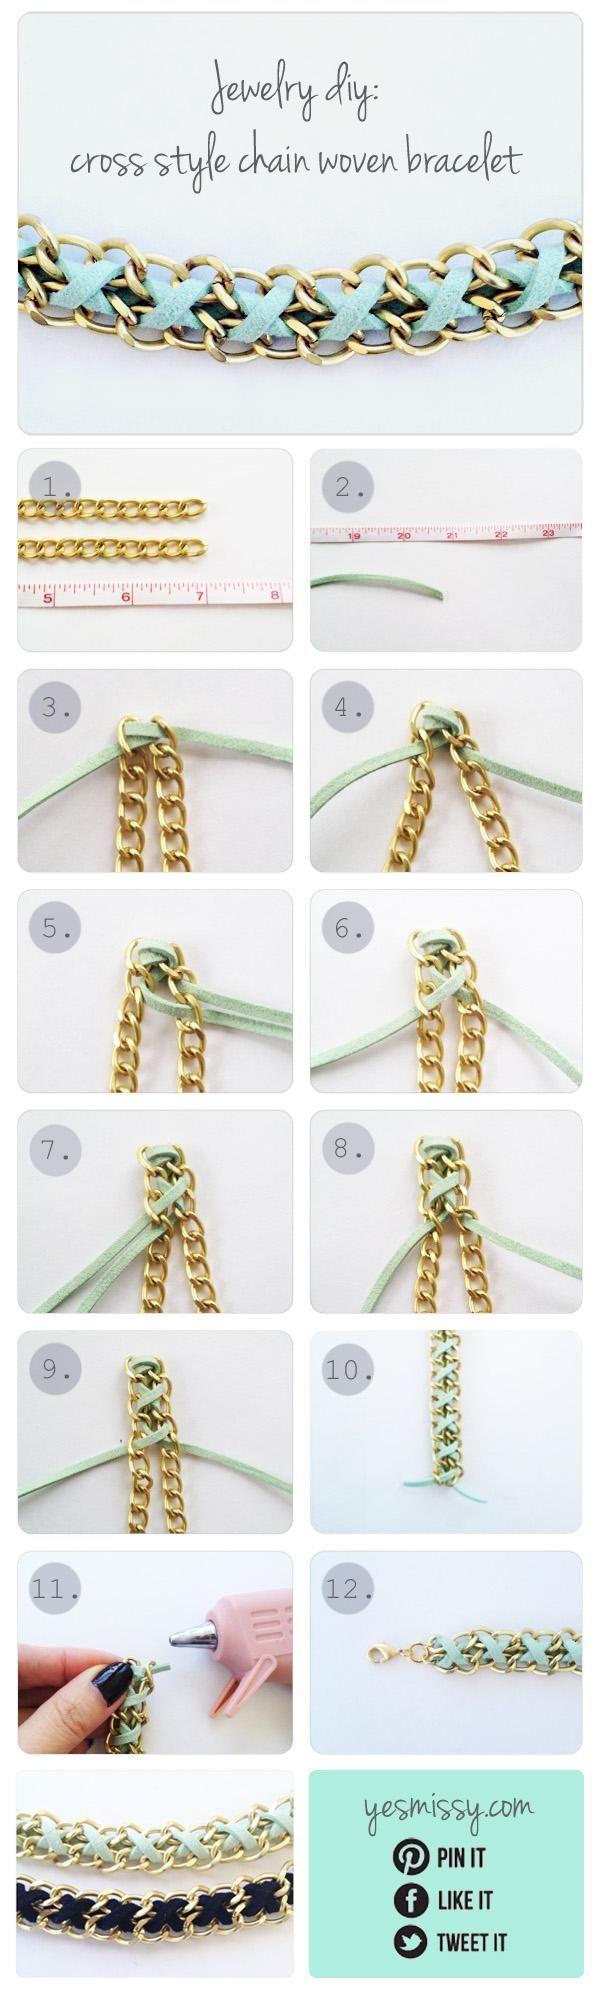 DIY Tutorial: DIY Friendship Bracelet / DIY Bracelet: Cross Style Chain Woven Bracelet - Bead&Cord